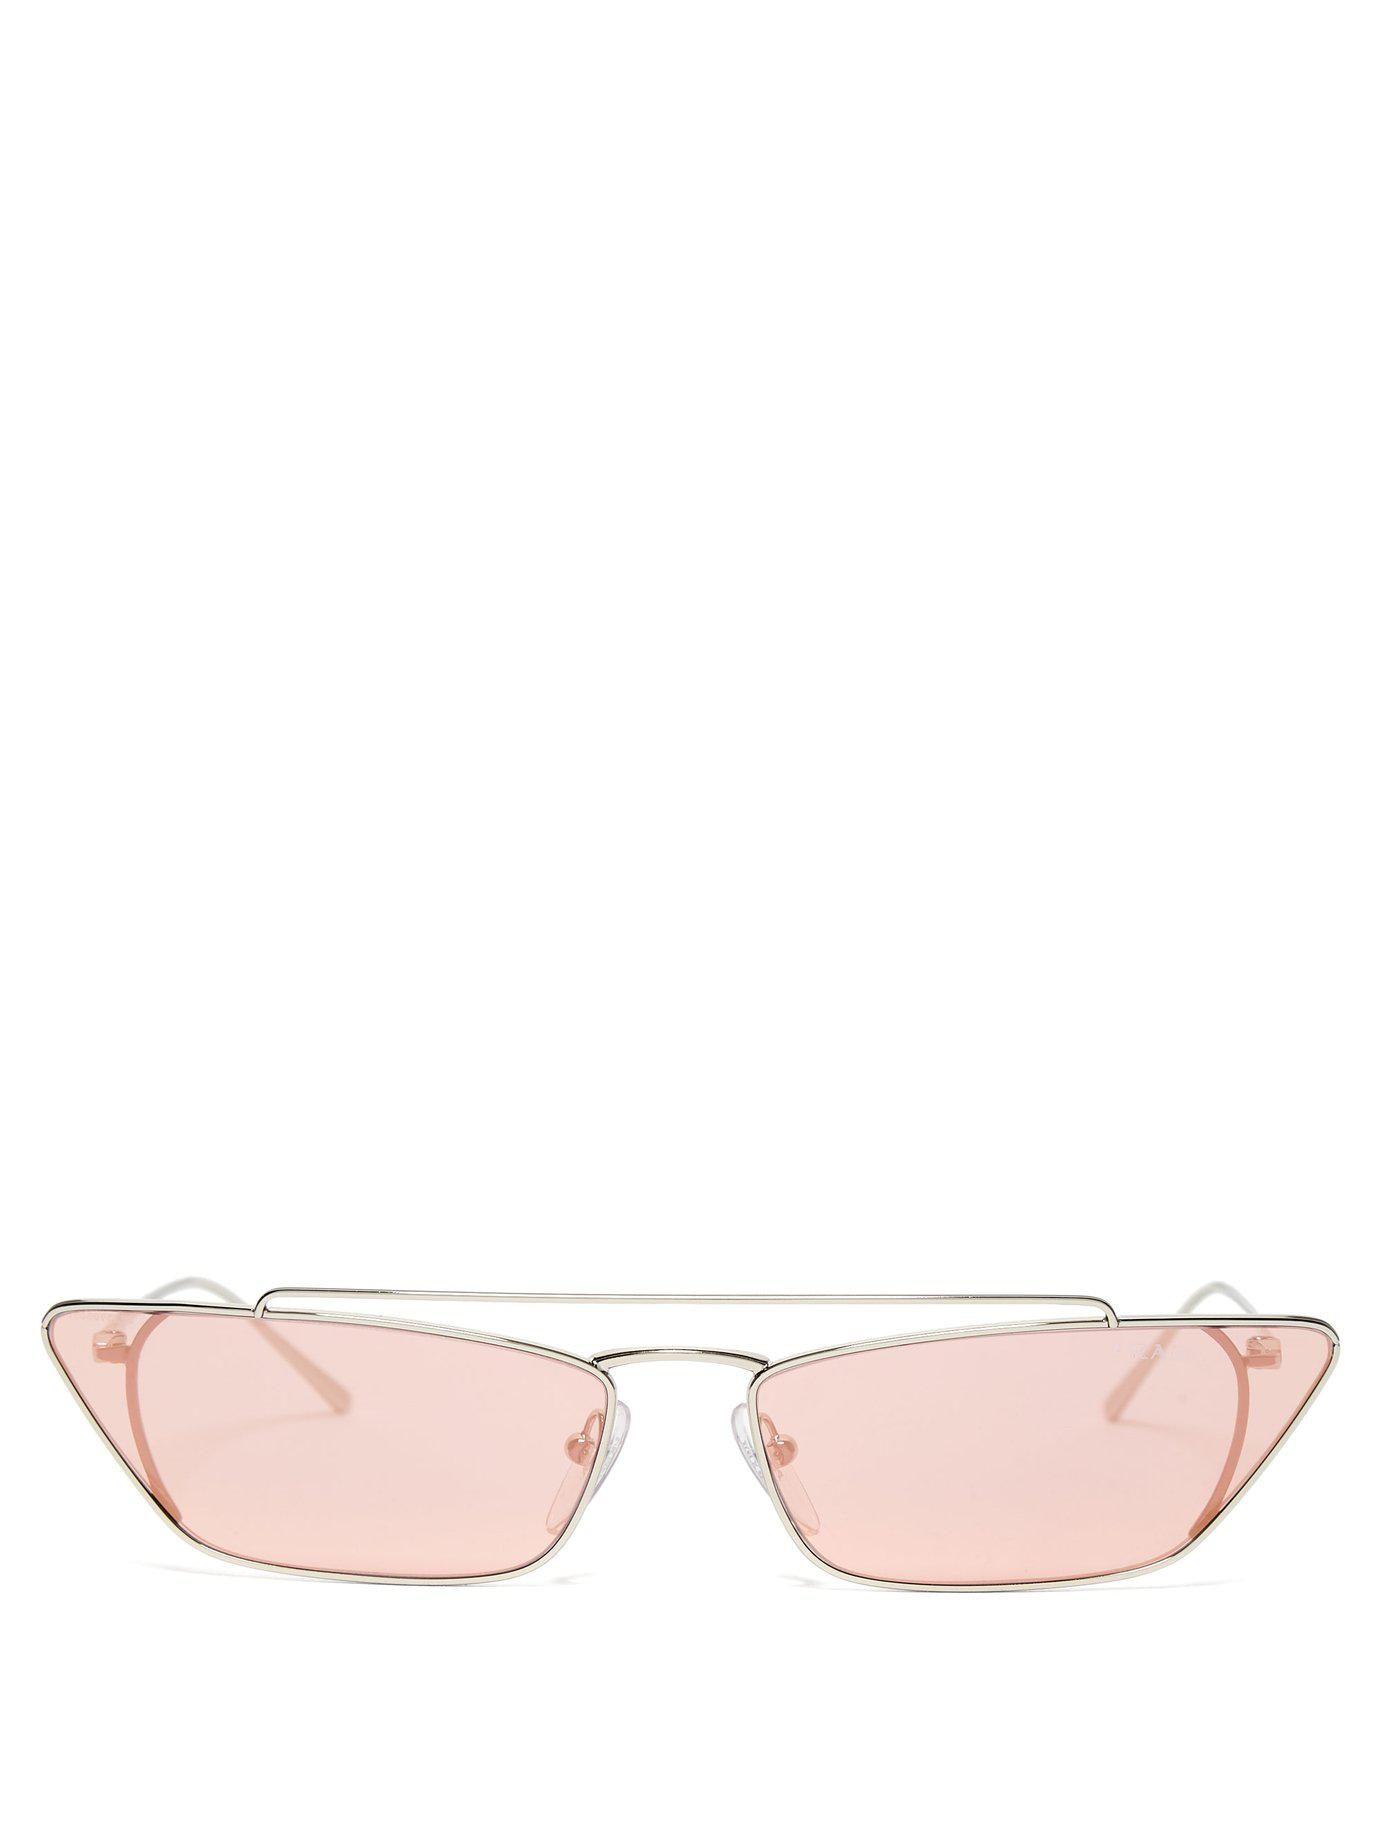 83d7edab03 Prada Ultravox Rectangular Frame Metal Sunglasses in Pink - Lyst